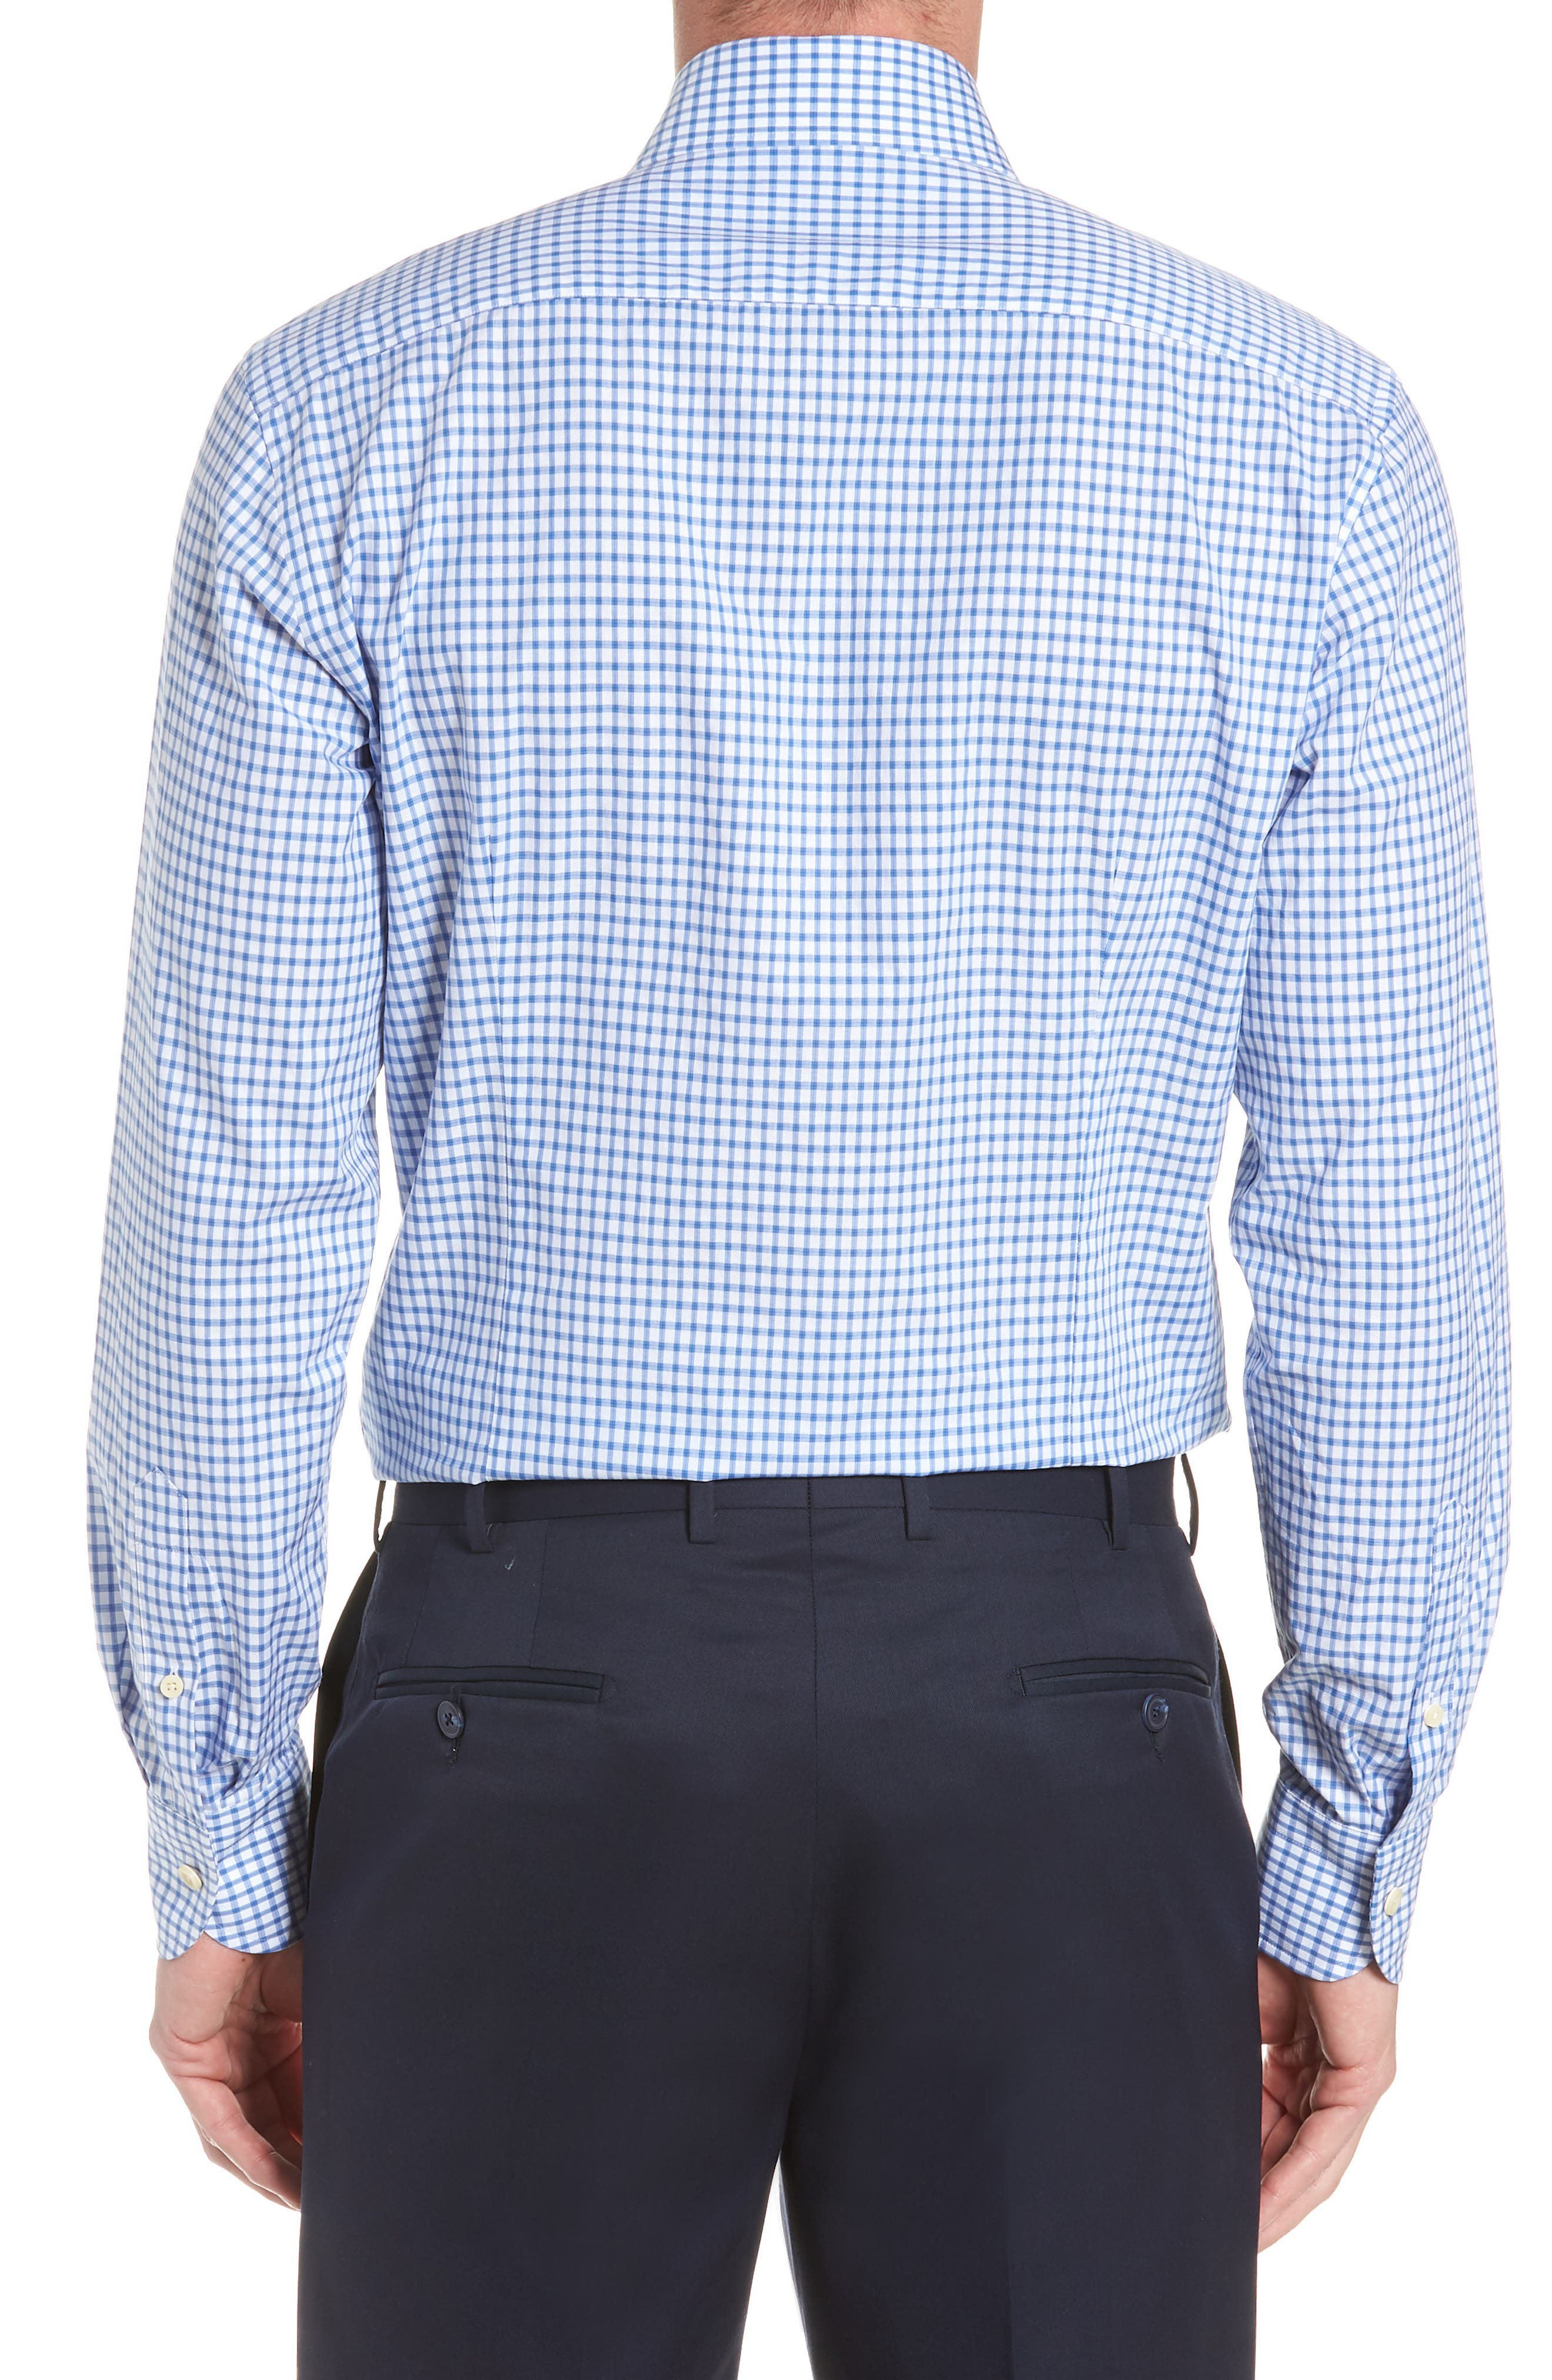 Garrison Slim Fit Check Dress Shirt,                             Alternate thumbnail 3, color,